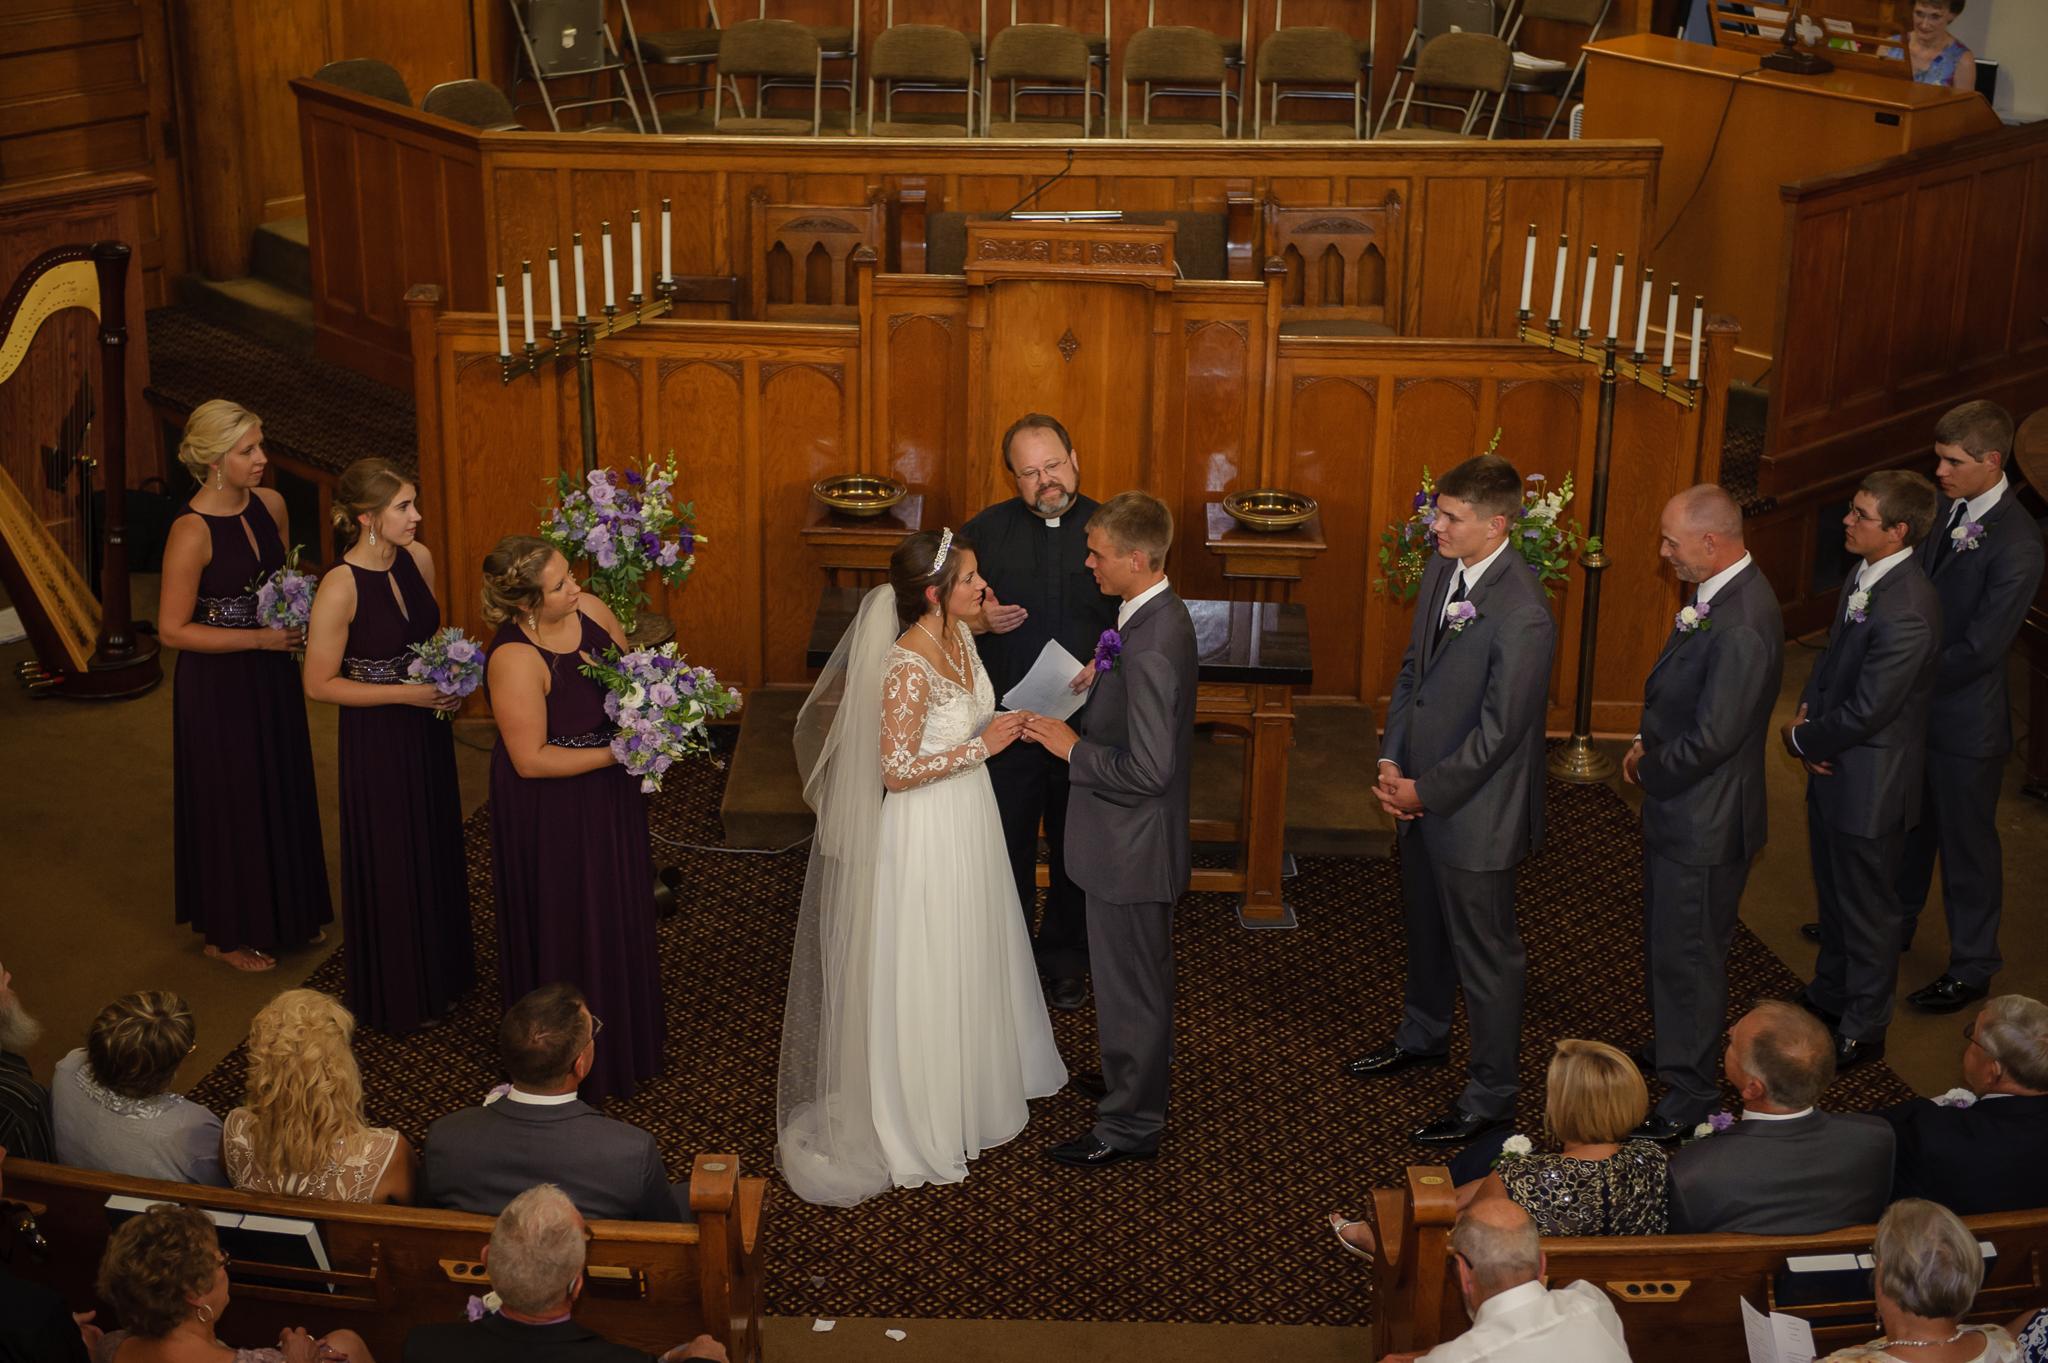 15-ashland washburn wedding photography700_4983.jpg